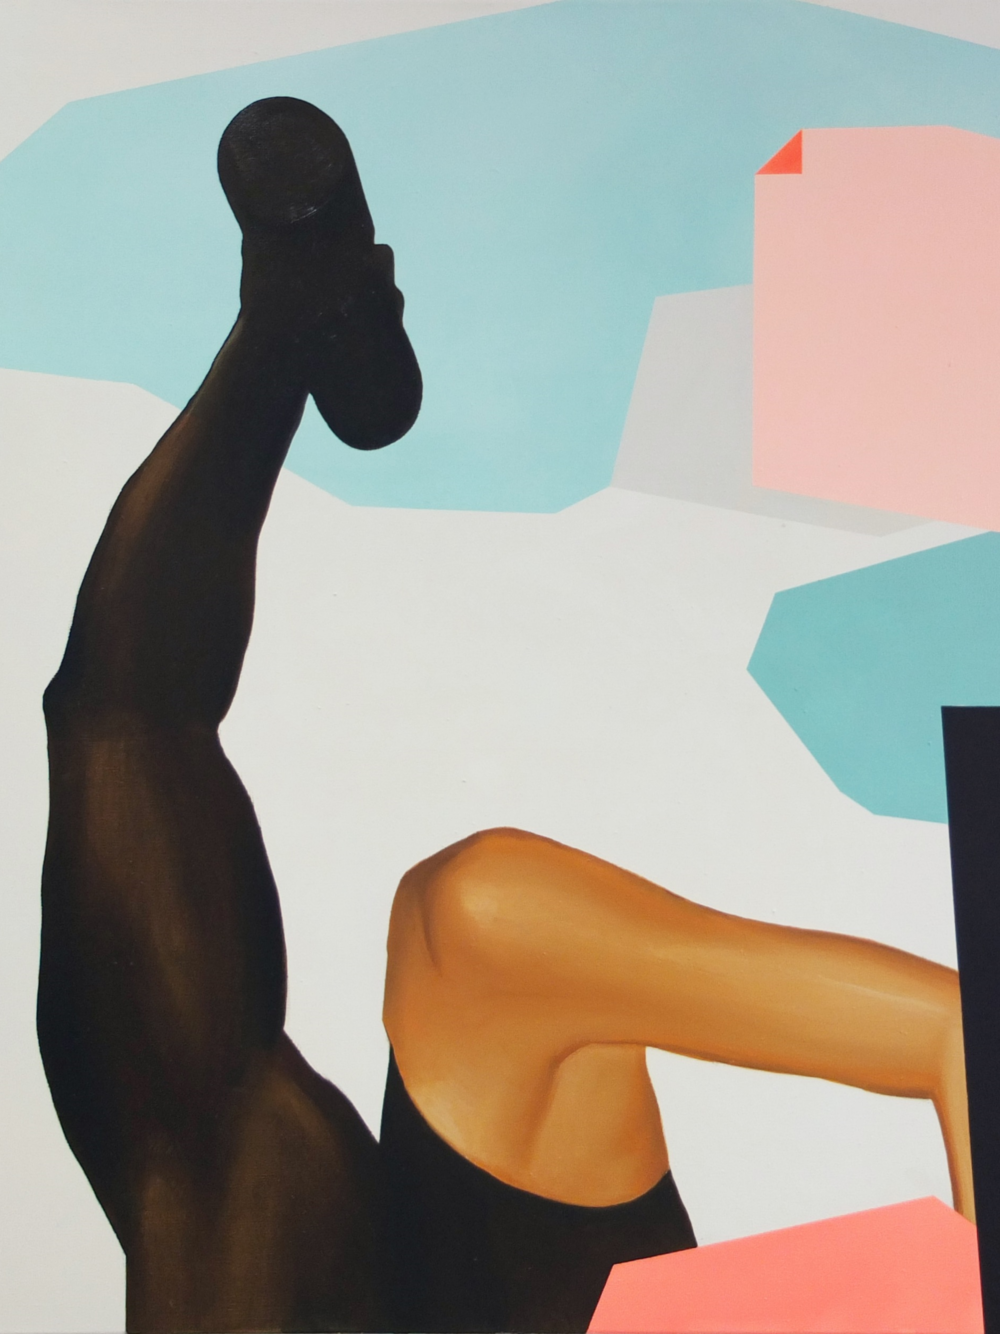 SEBASTIAN MENZKE high low , Öl auf Leinwand,100 x 90 cm, 2016